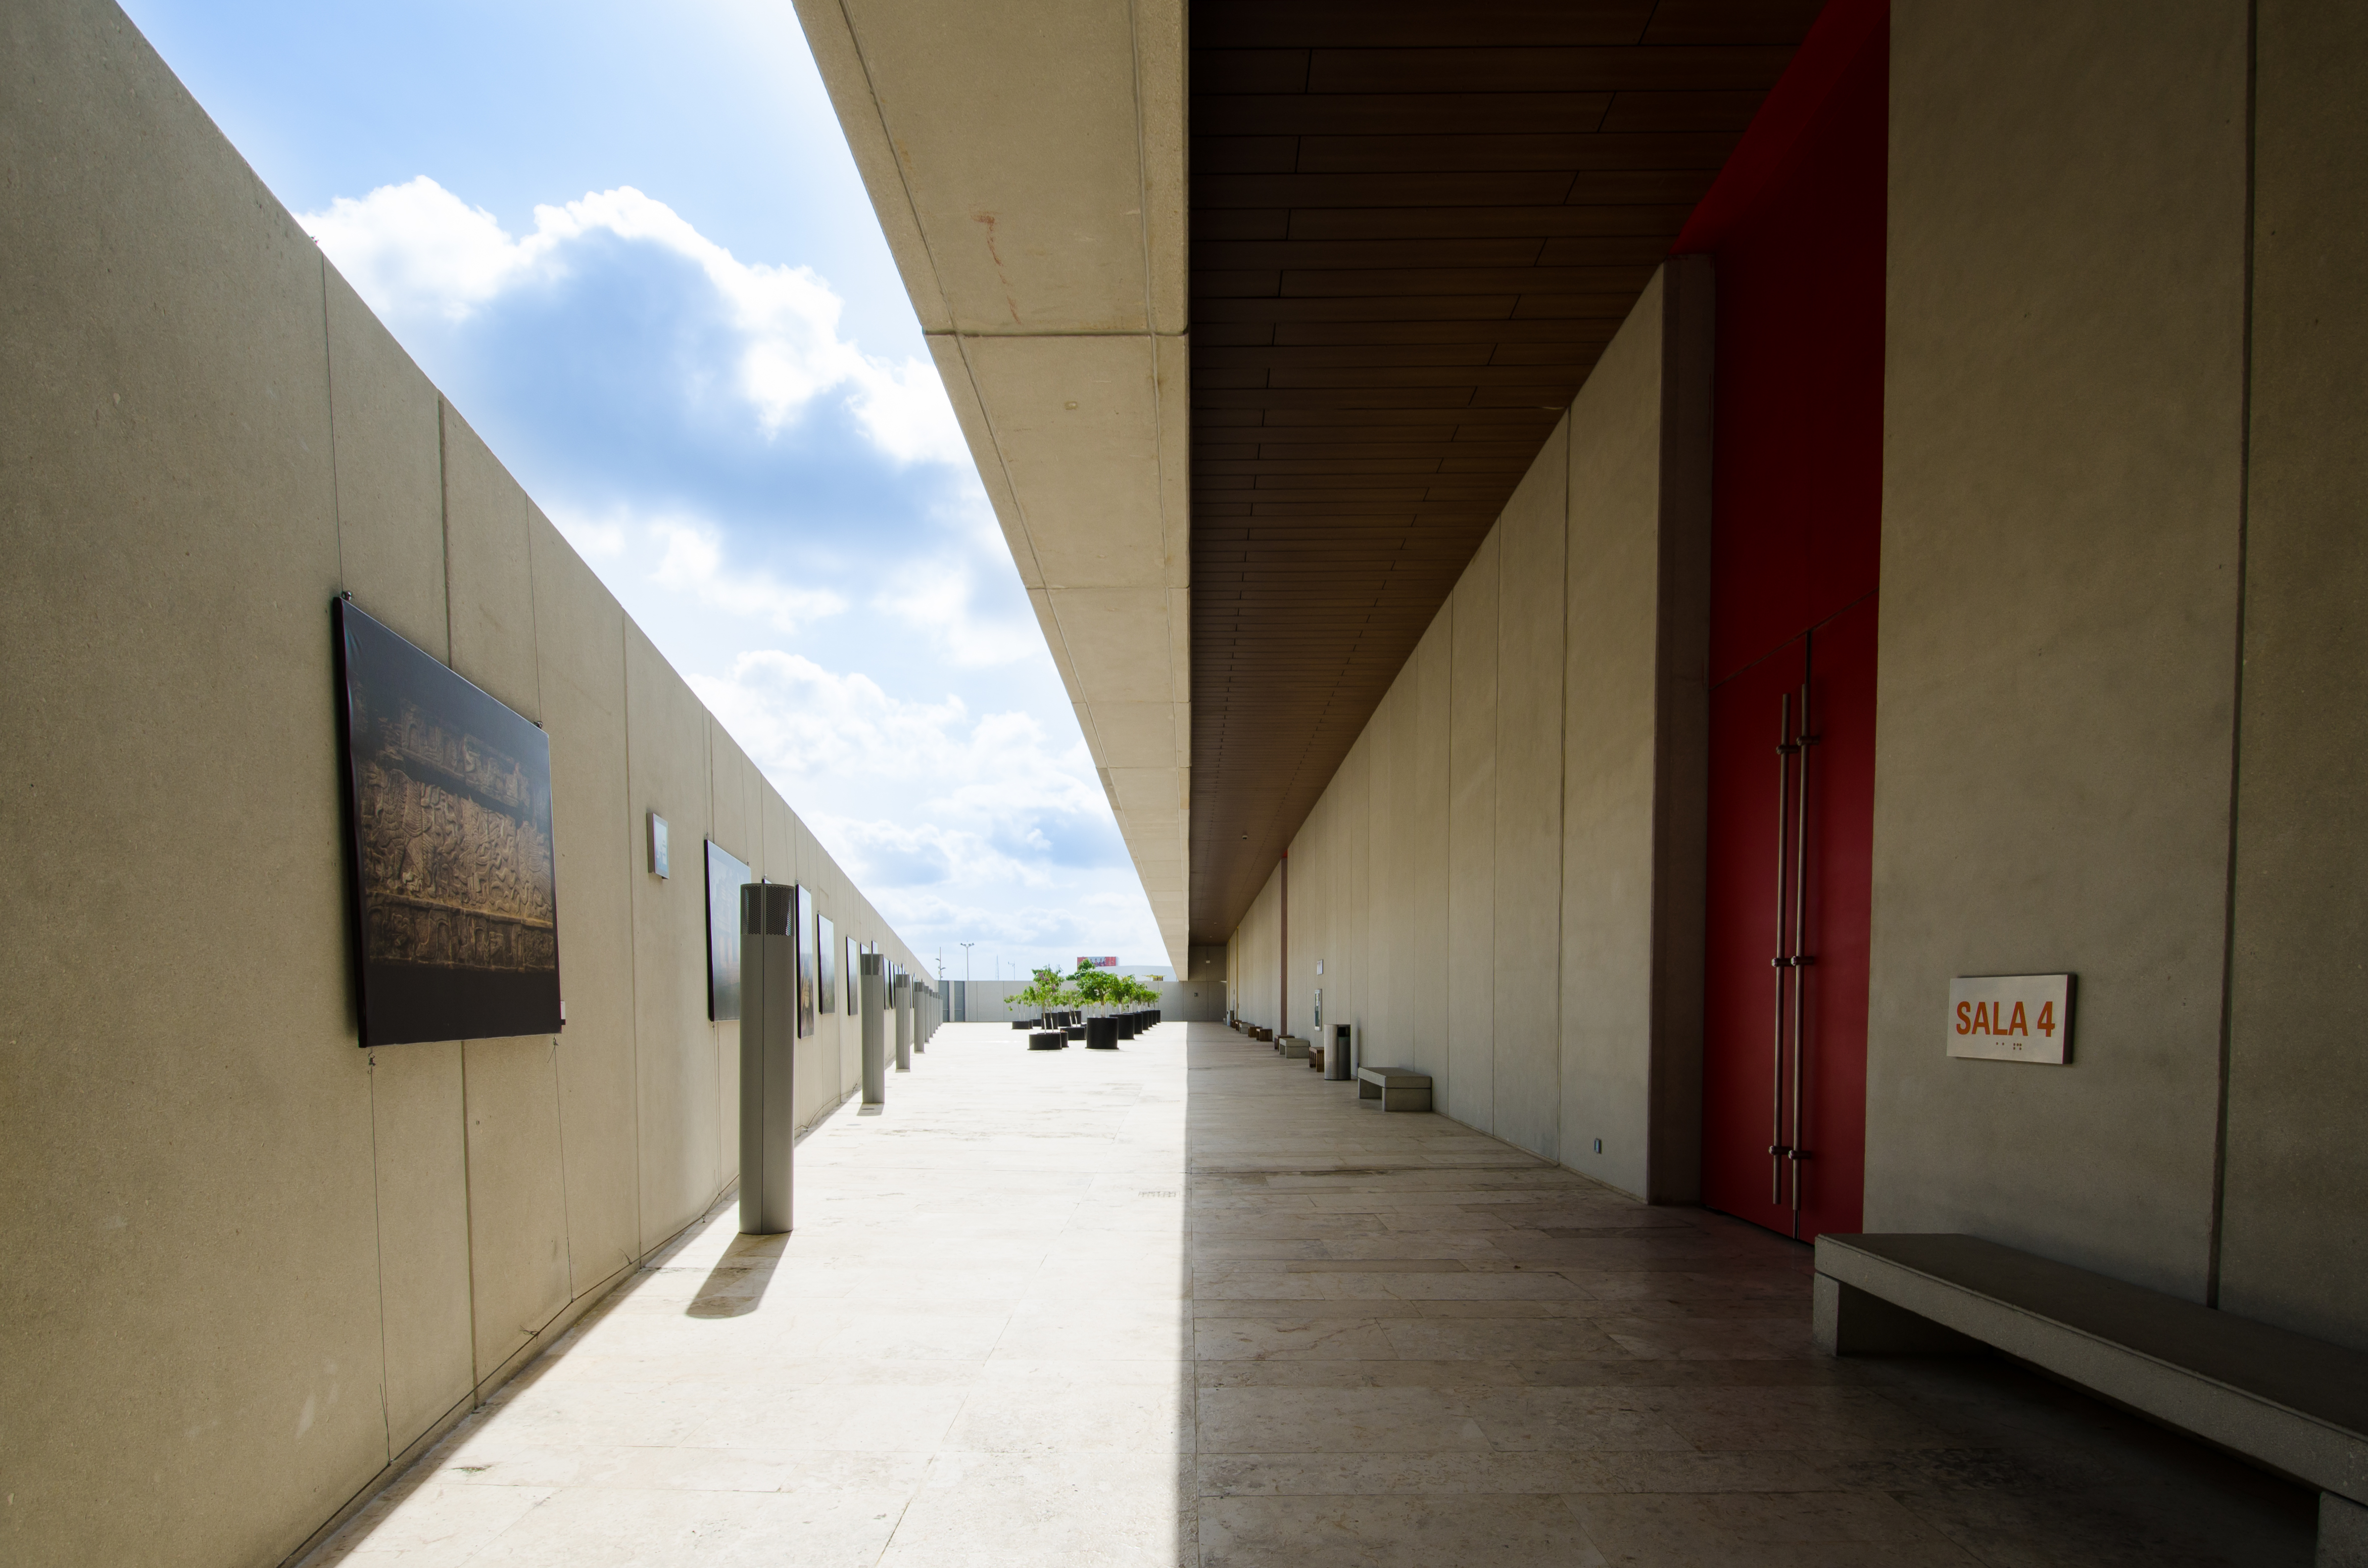 Gran Museo del Mundo Maya, Mérida, Yucatán